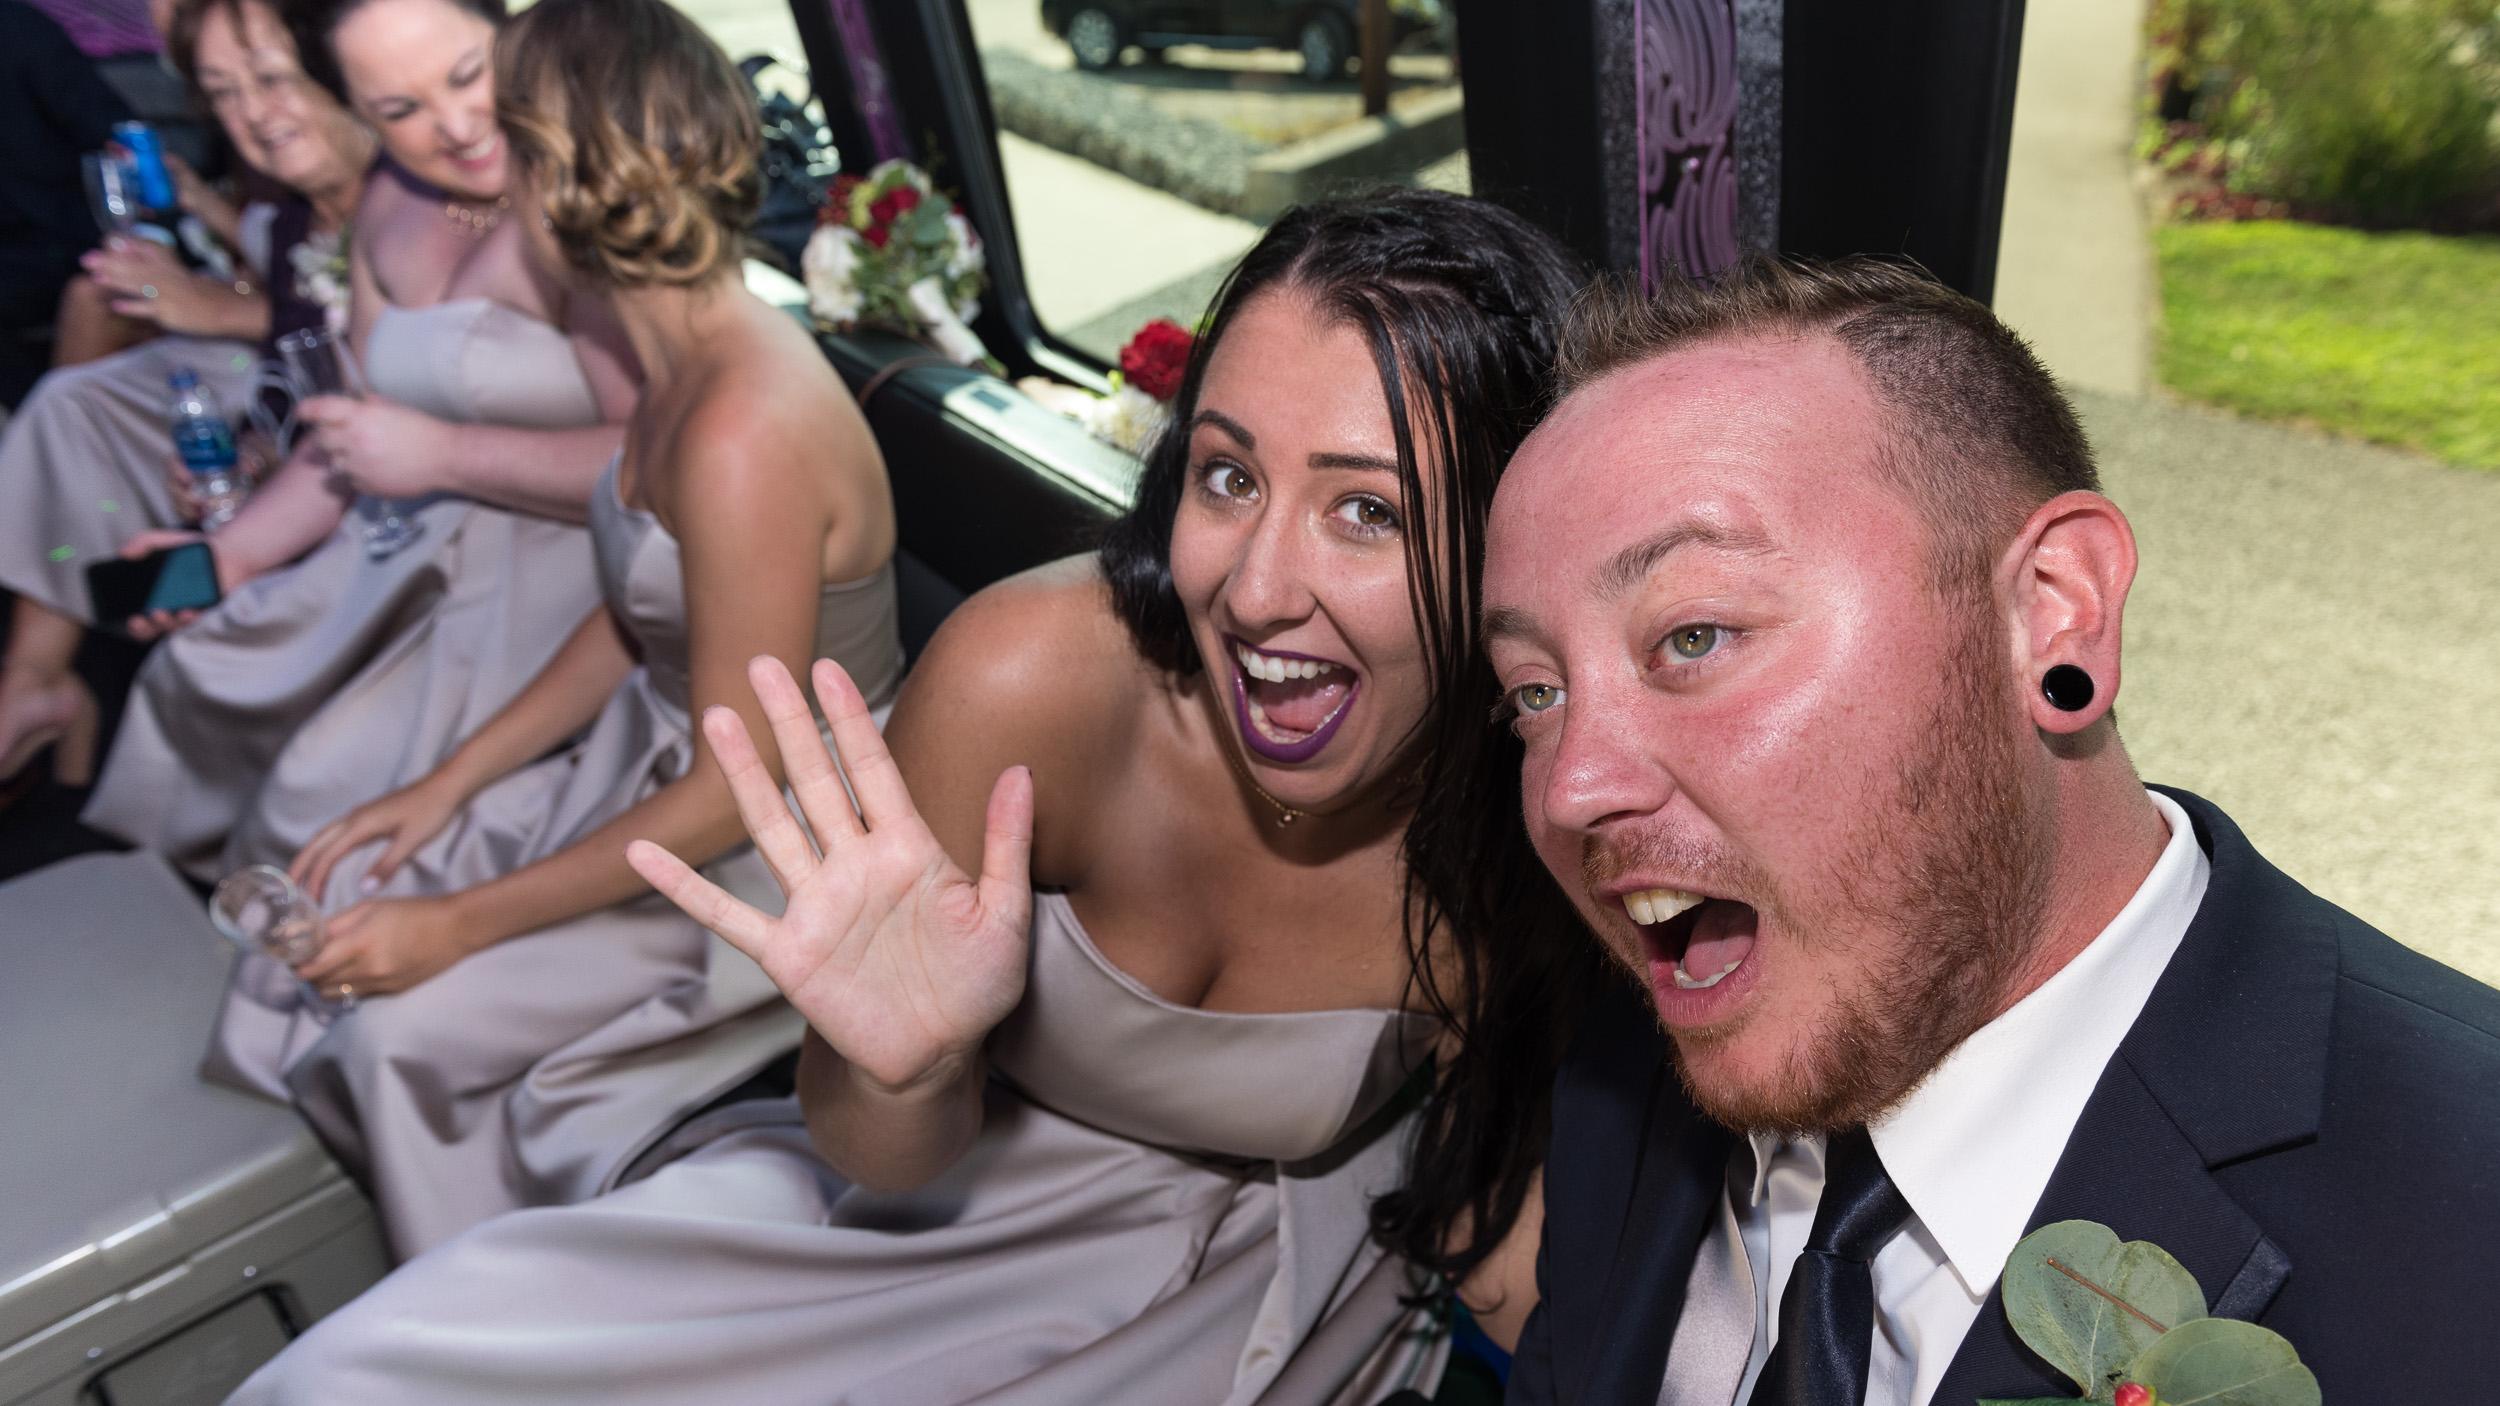 Wedding-Party-Bus-Photography-1.jpg